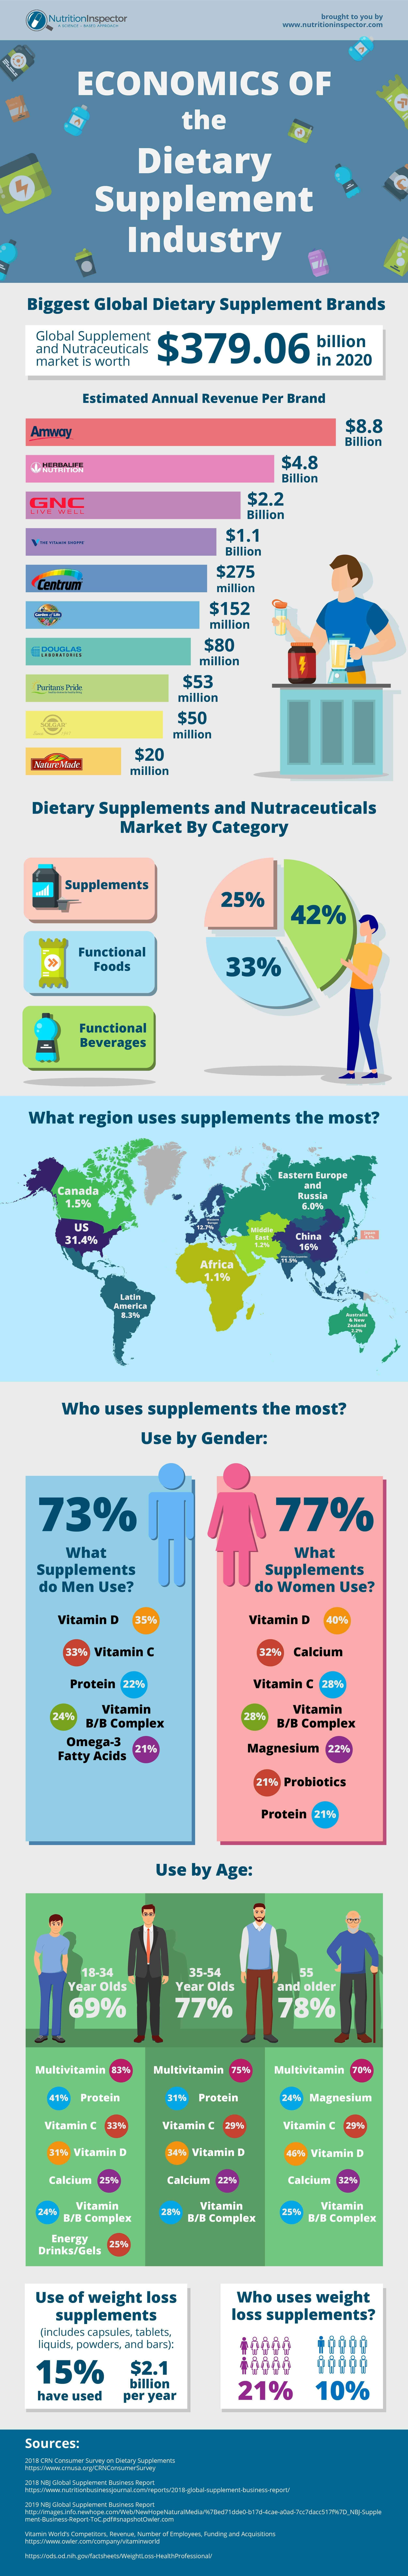 Economics of the diet supplement industry infographic